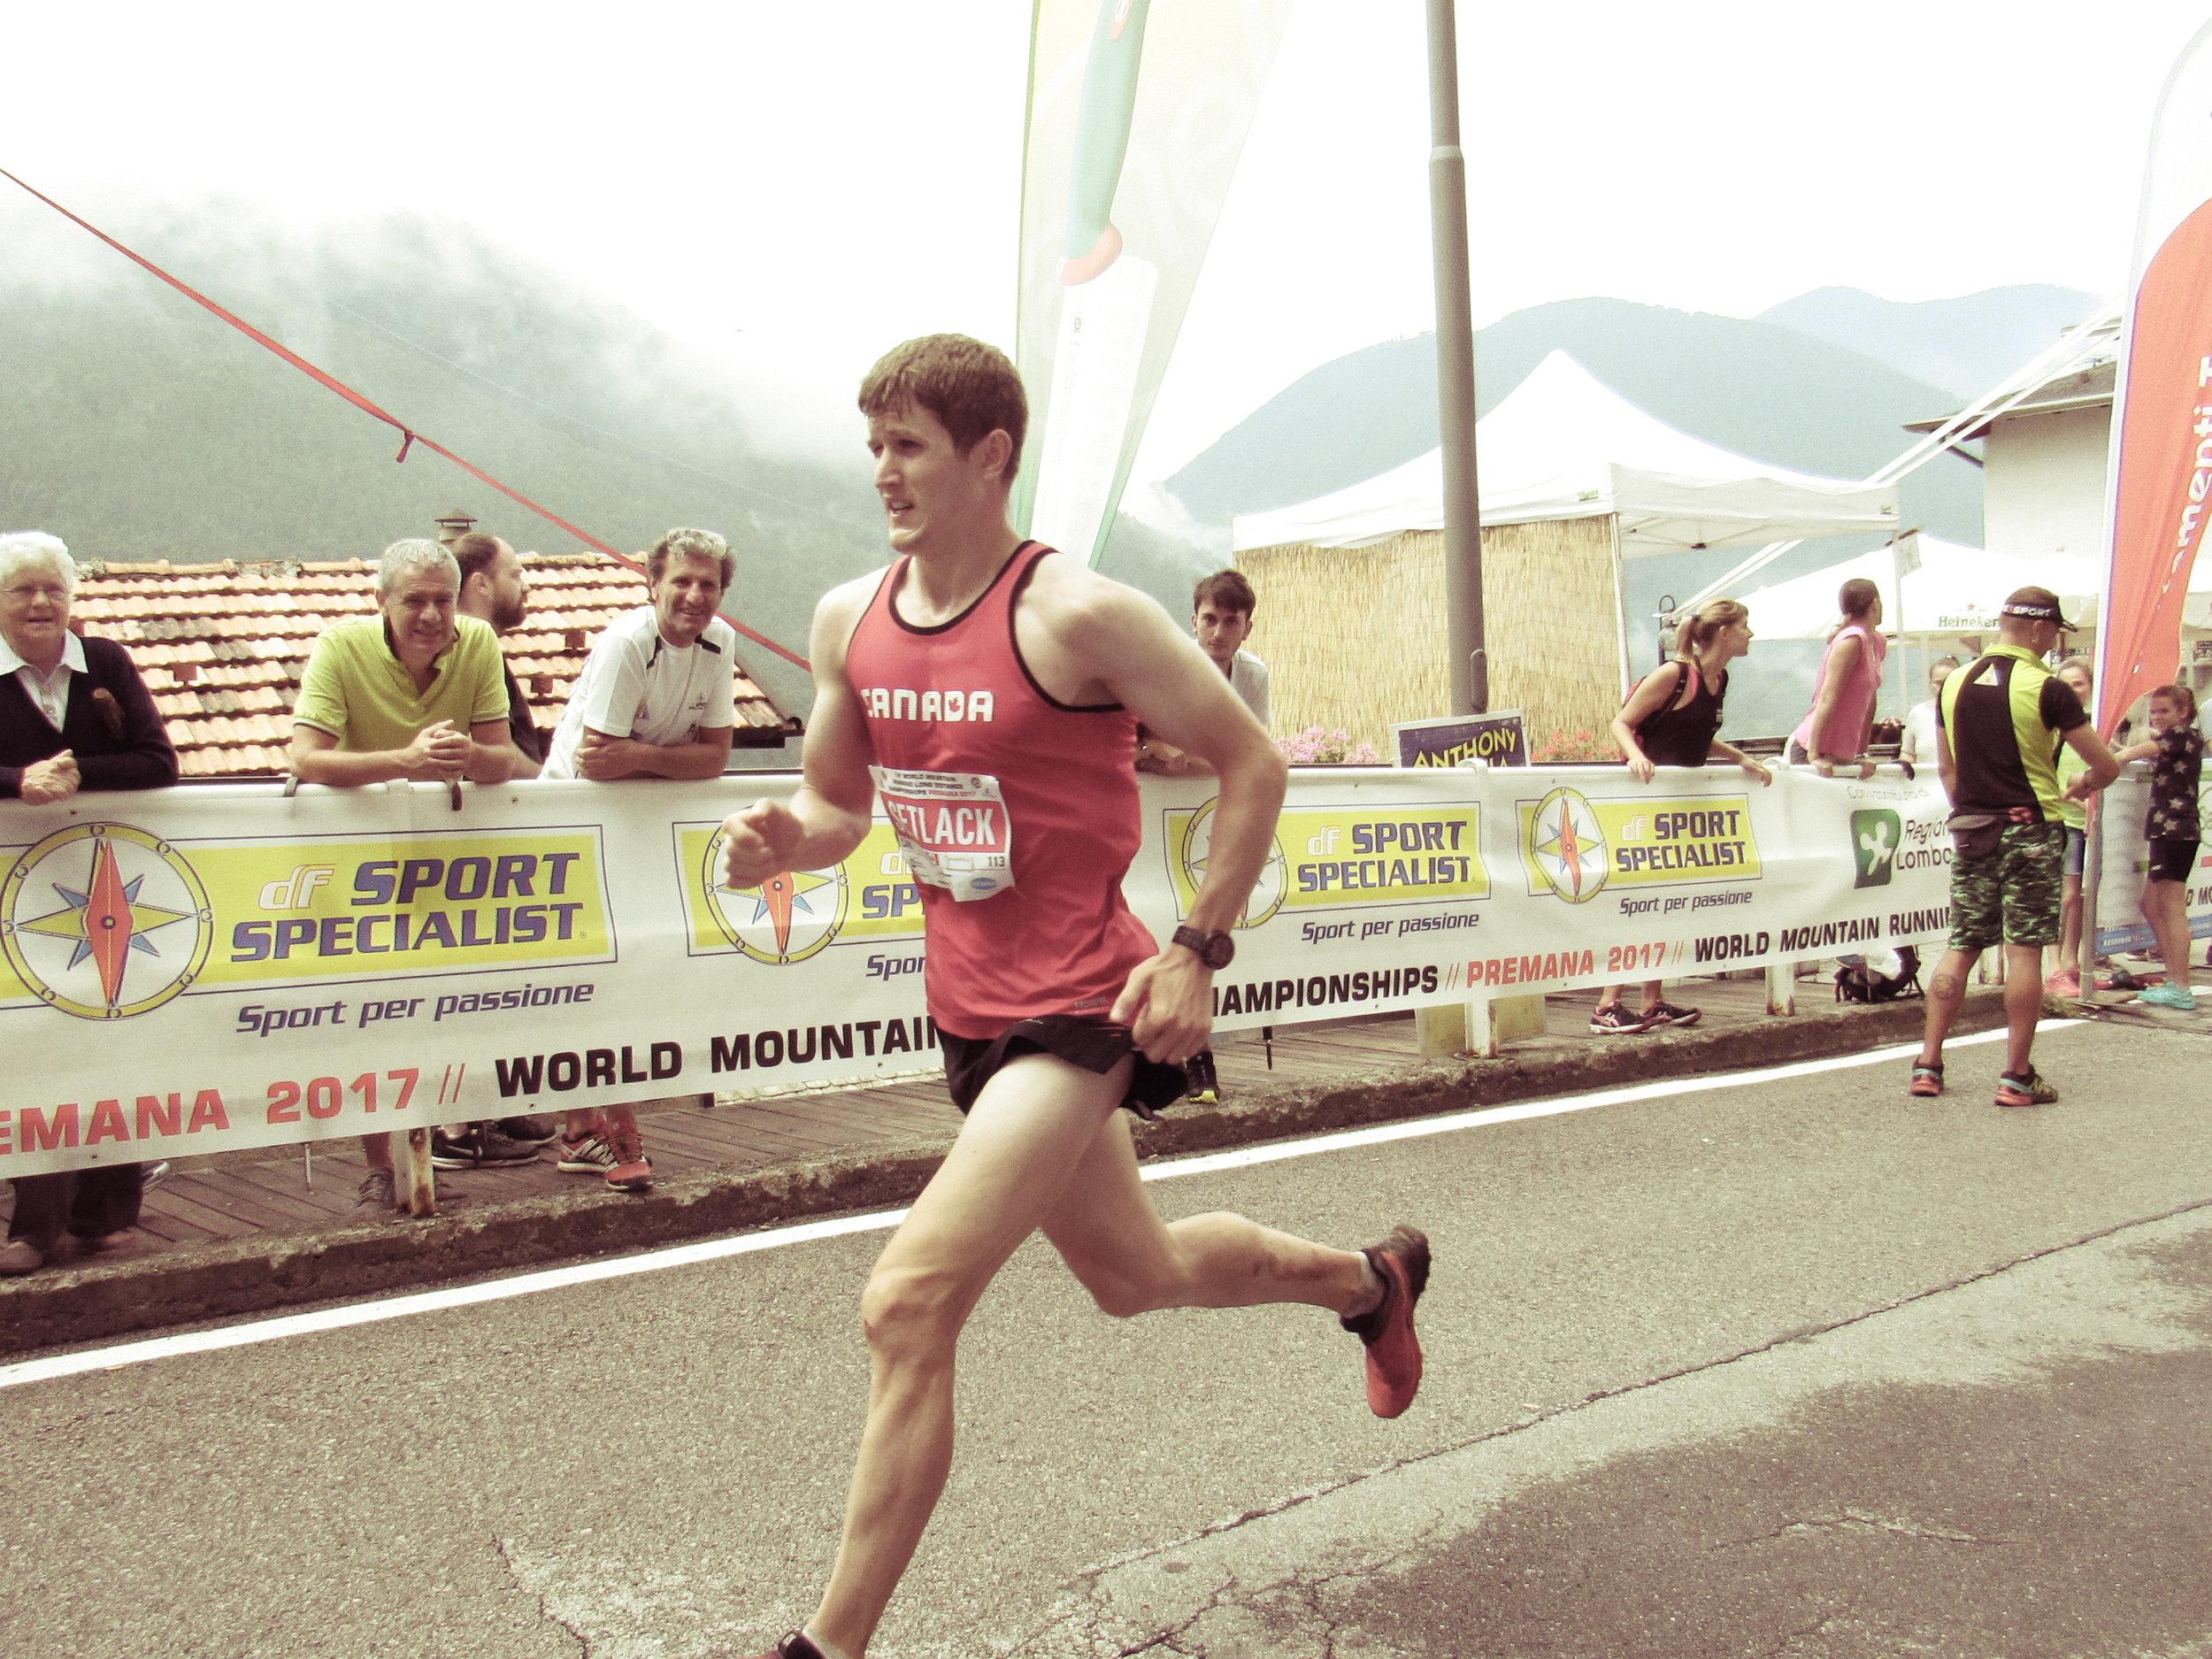 Matt Setlack finishing the Long Course World Mountain Running Championships (PC: Abigail Smith).